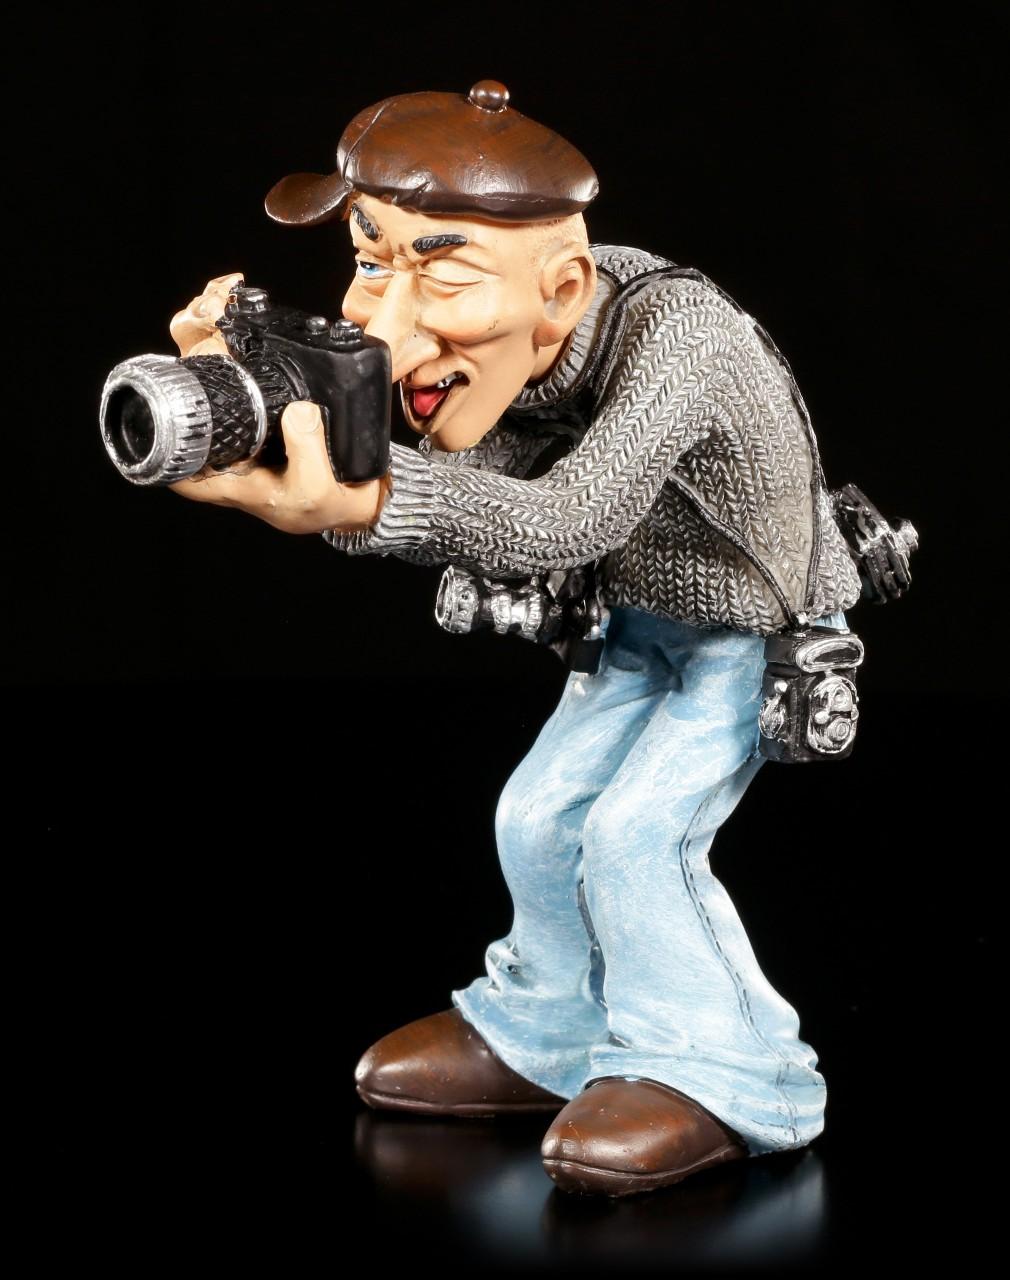 Funny Job Figurine - Photographer with modern Camera